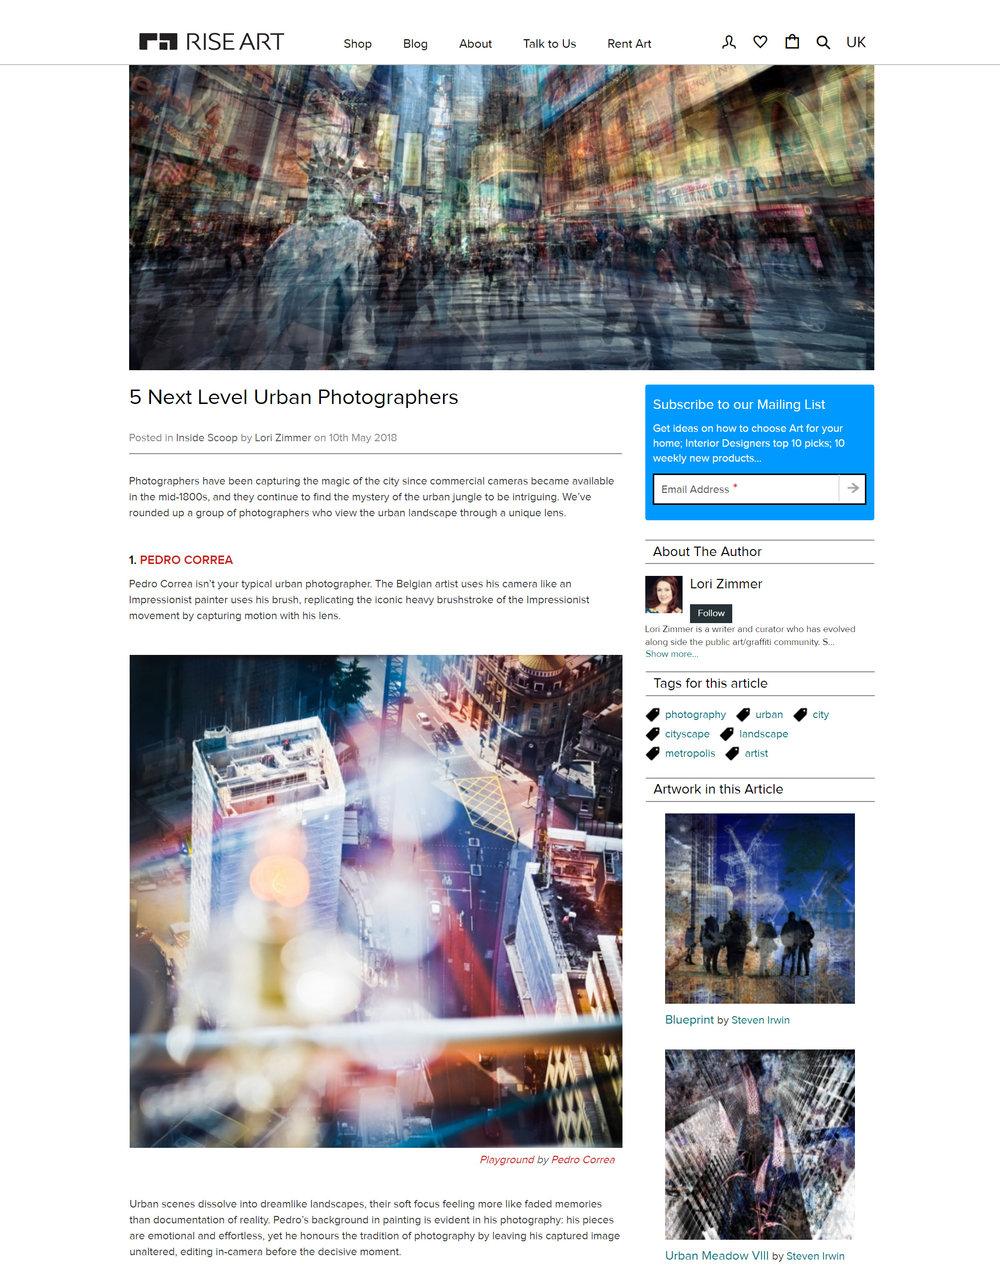 Top 5 Next Level Urban Photographers